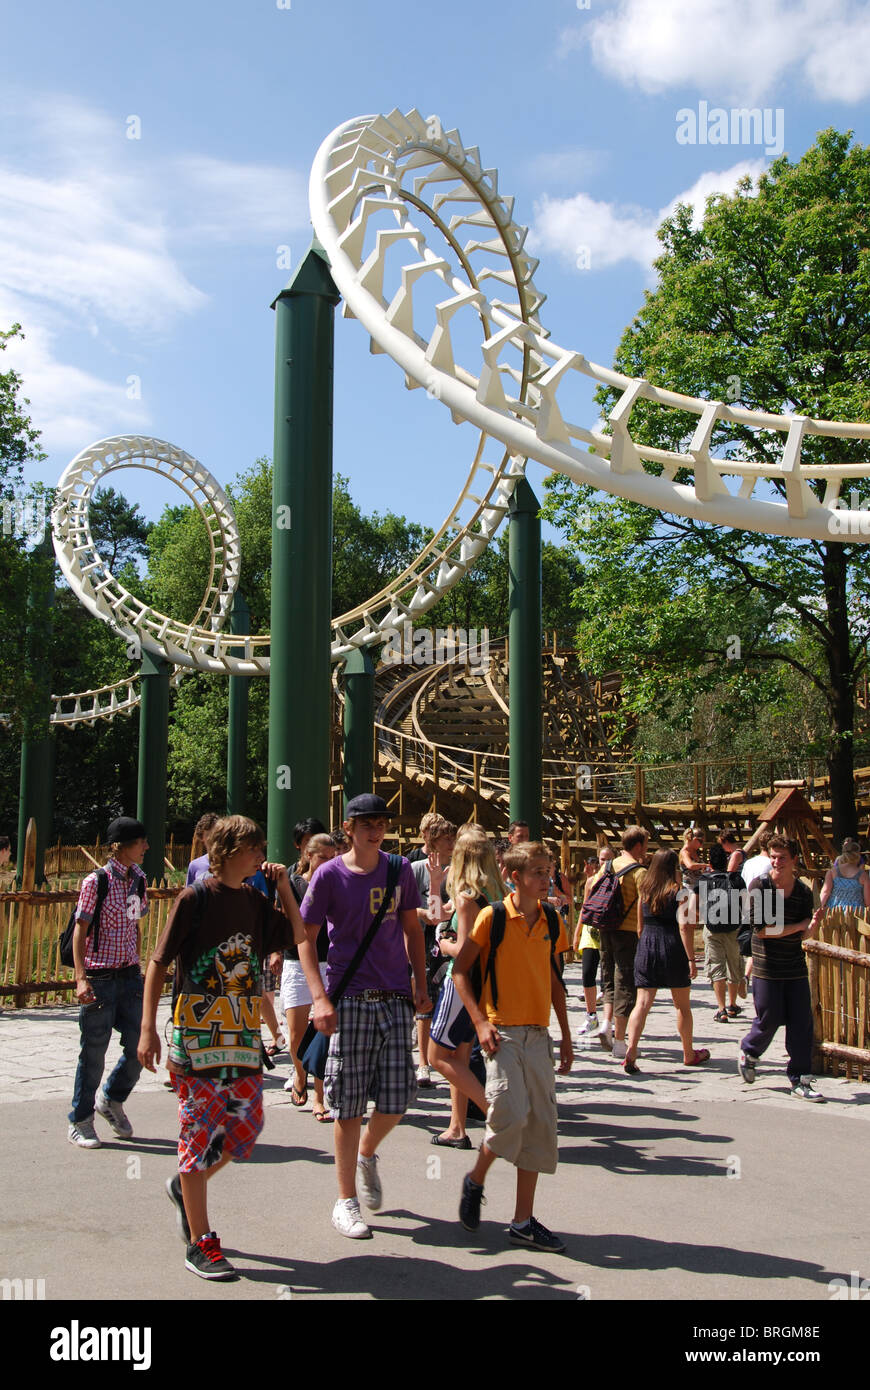 Teens at theme park stock photos teens at theme park for Amusement park netherlands